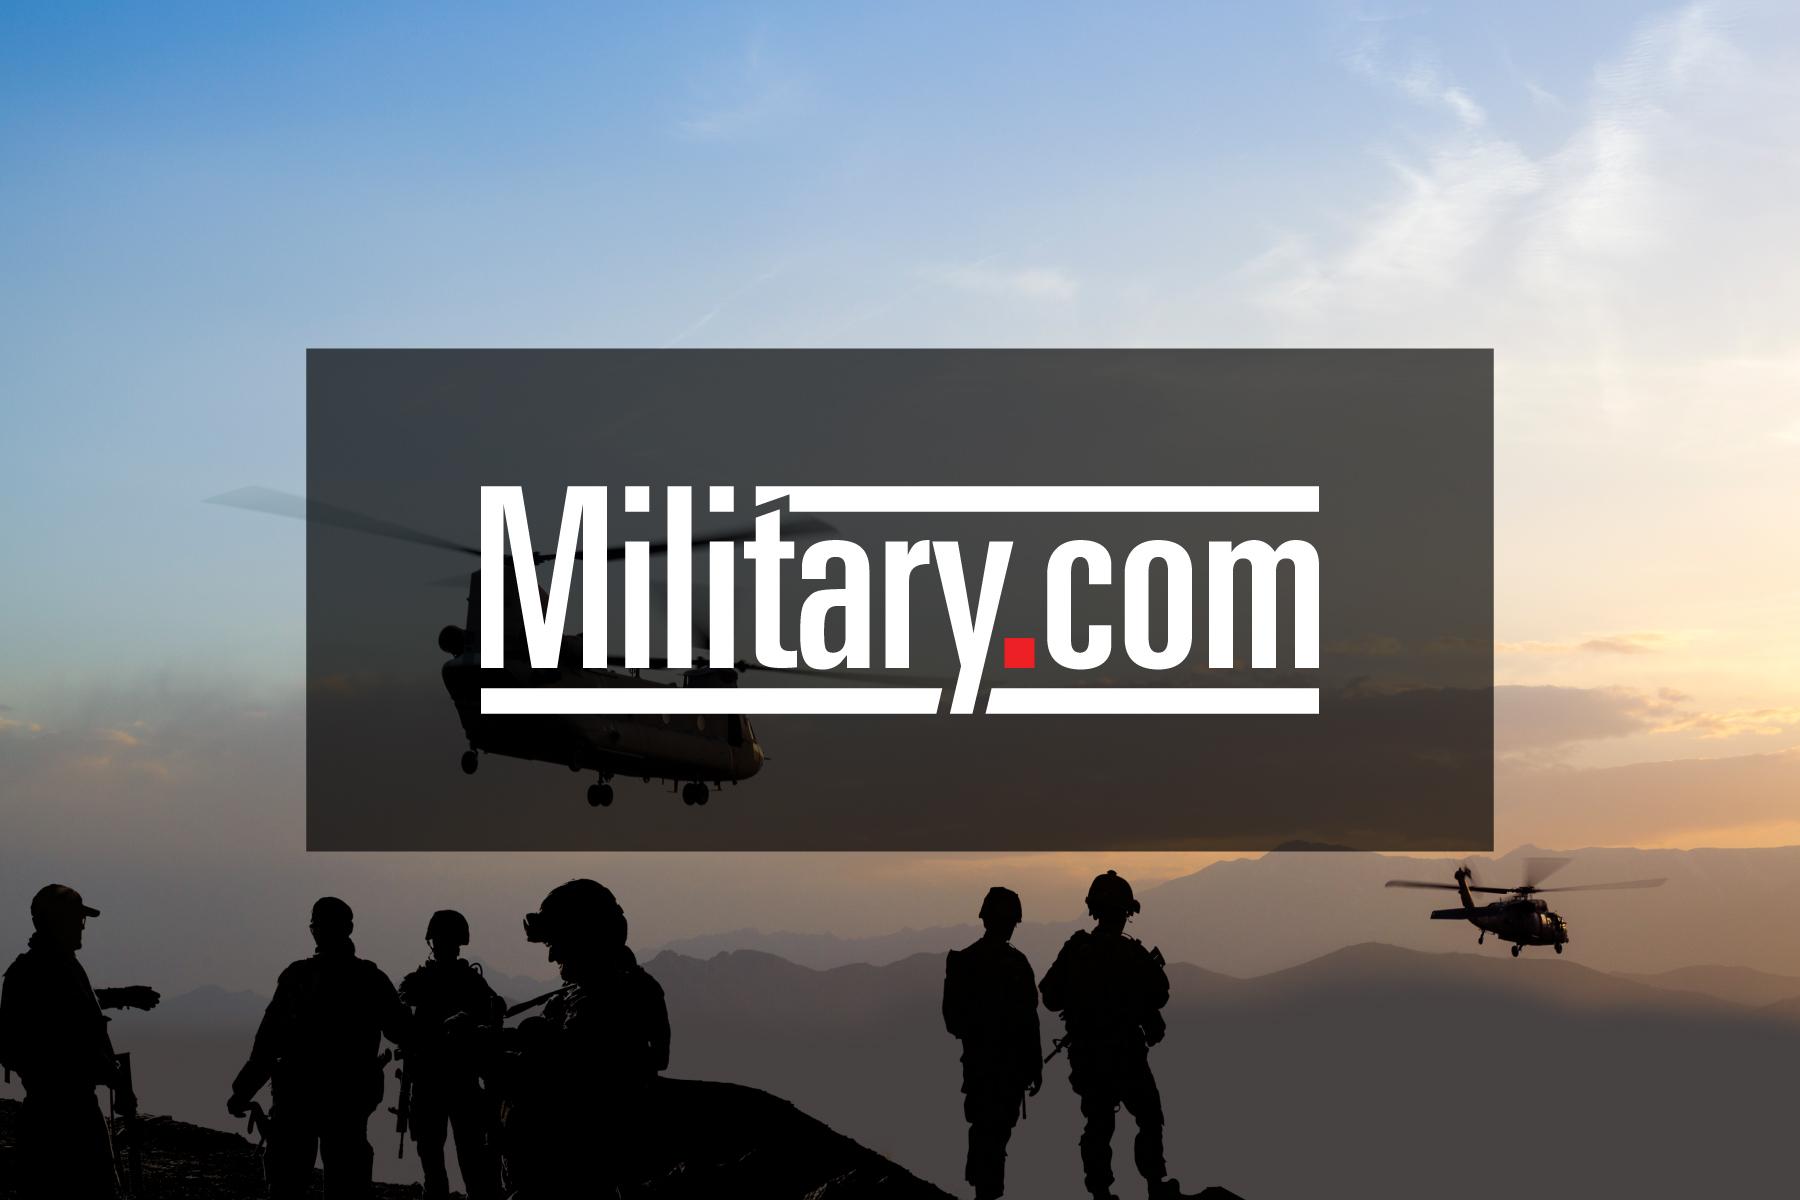 Rotor Issue Caused Marine Helo's Emergency Landing in ...